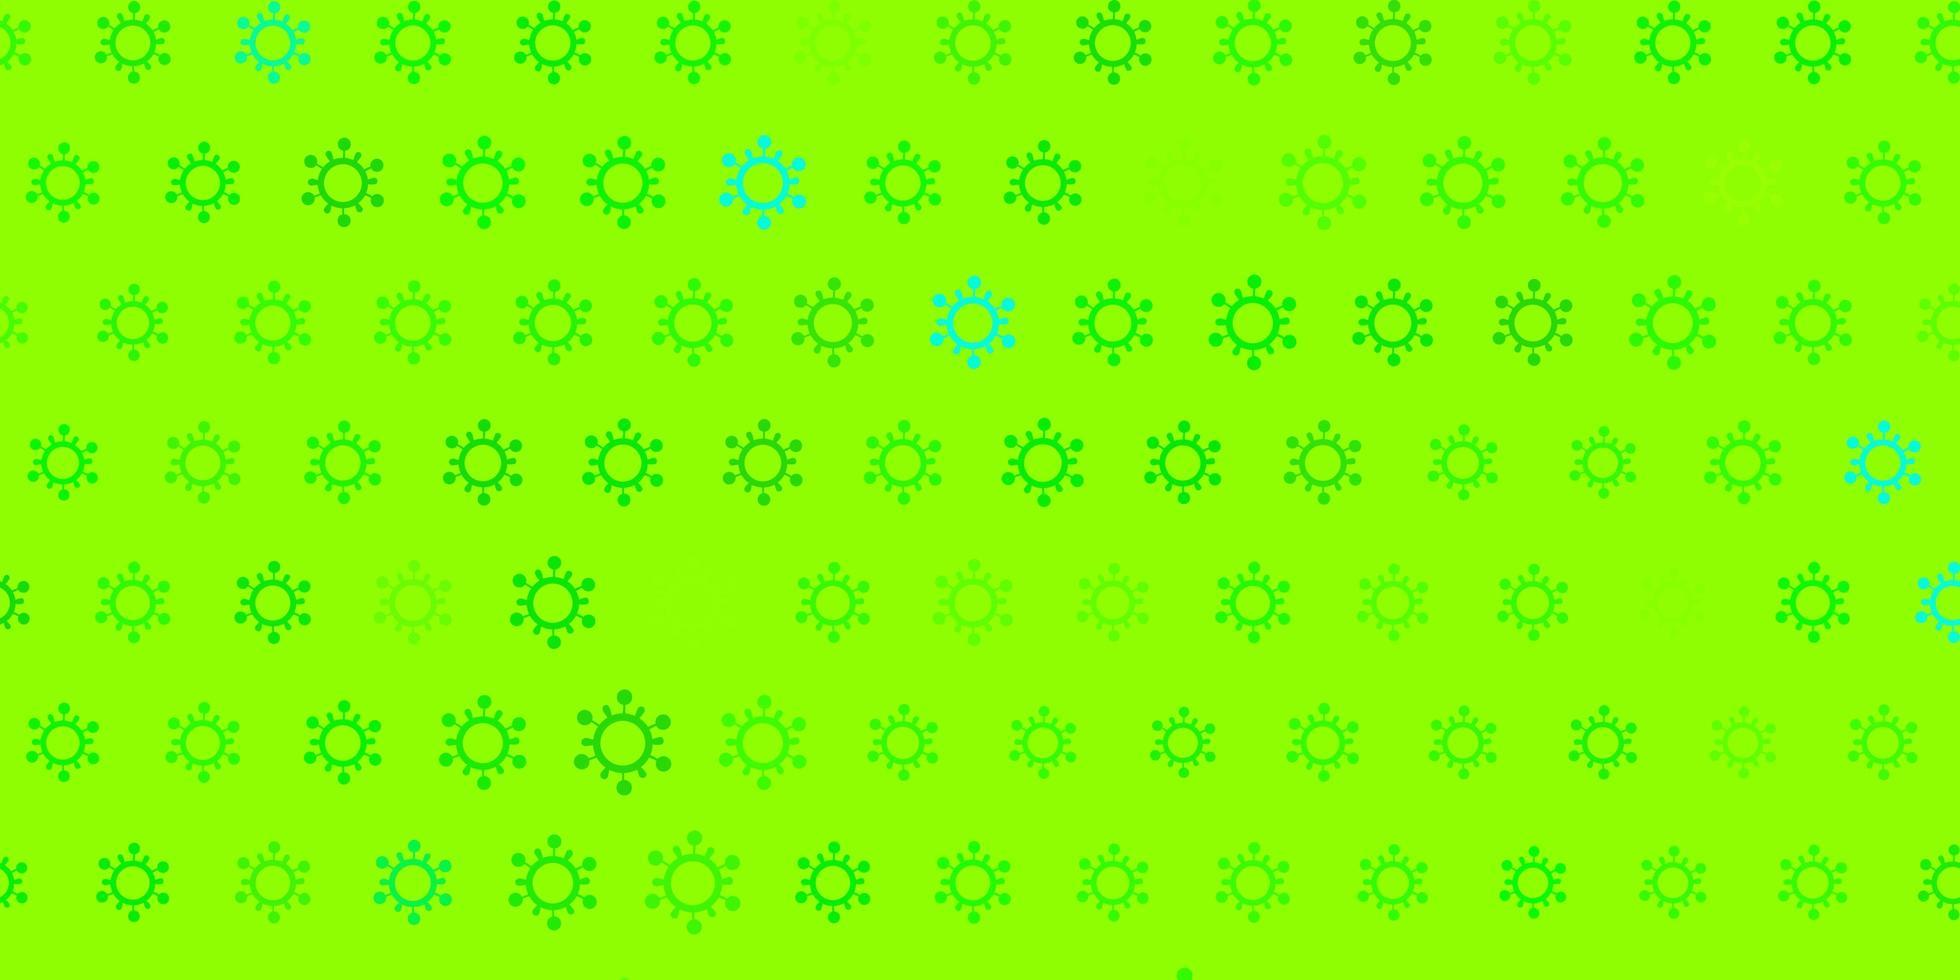 hellgrüne Textur mit Krankheitssymbolen. vektor